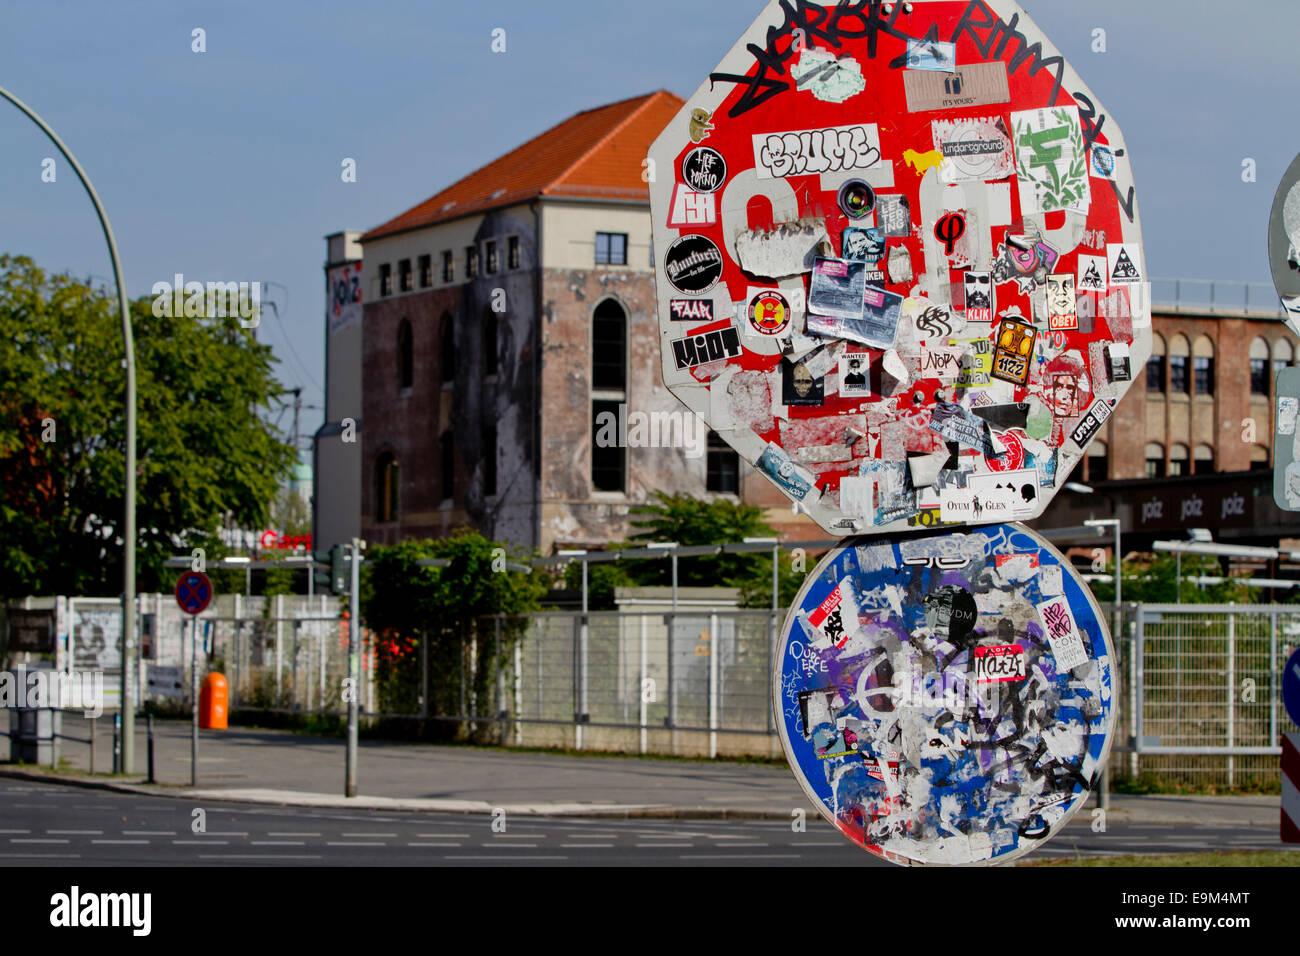 street furniture signs graffiti colourful bulbs - Stock Image